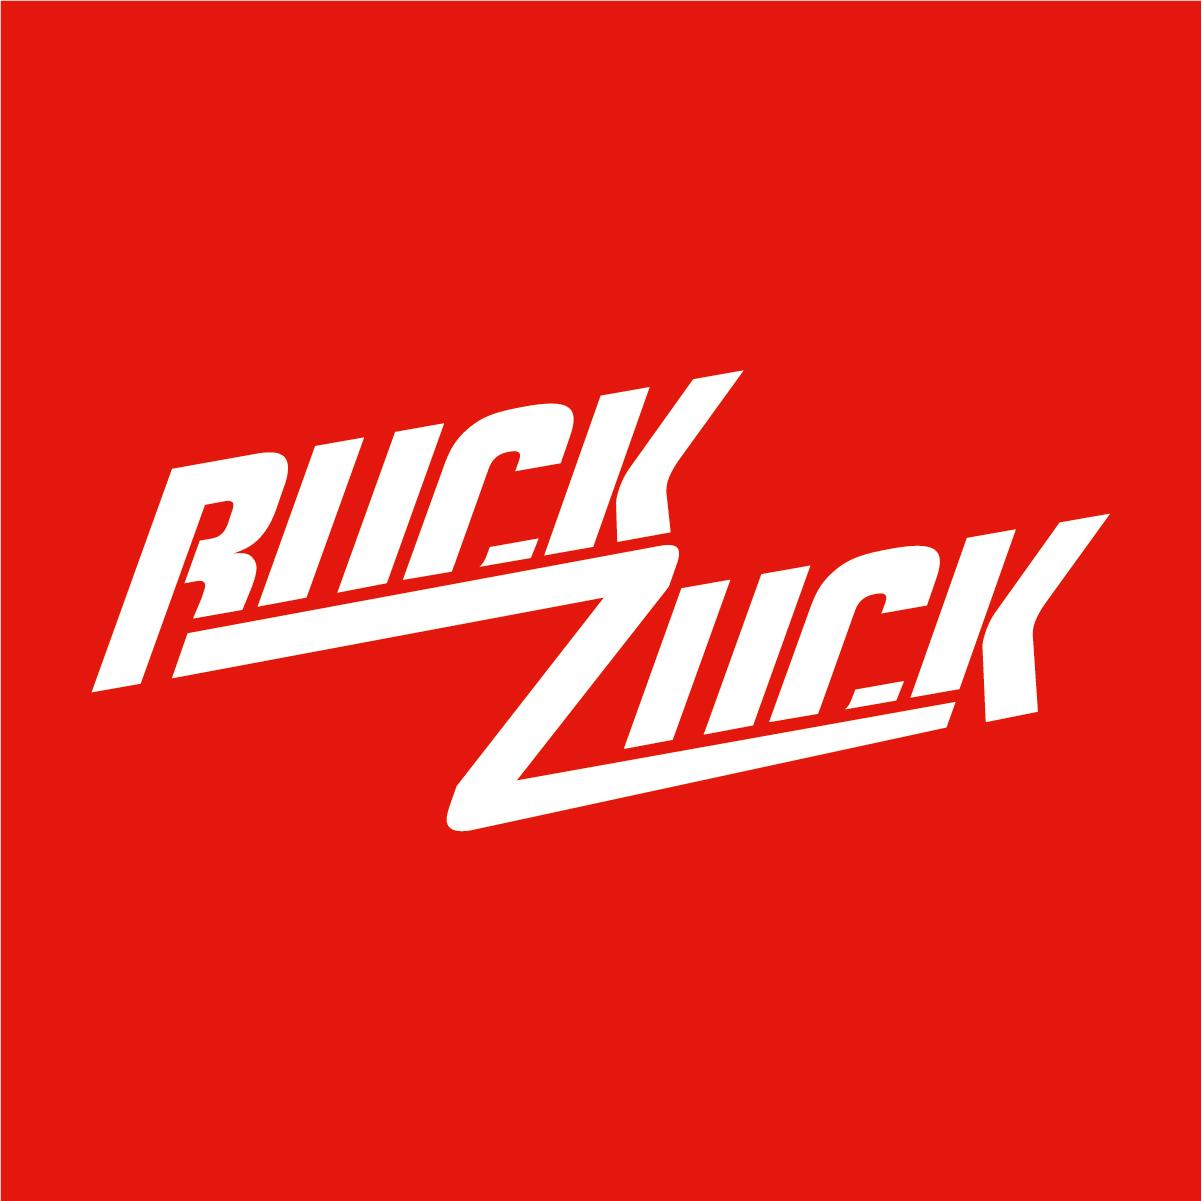 MUSTER CERAMIN VARIO 3mm Fliese x-tra breit Nero Assuluto PVC-frei